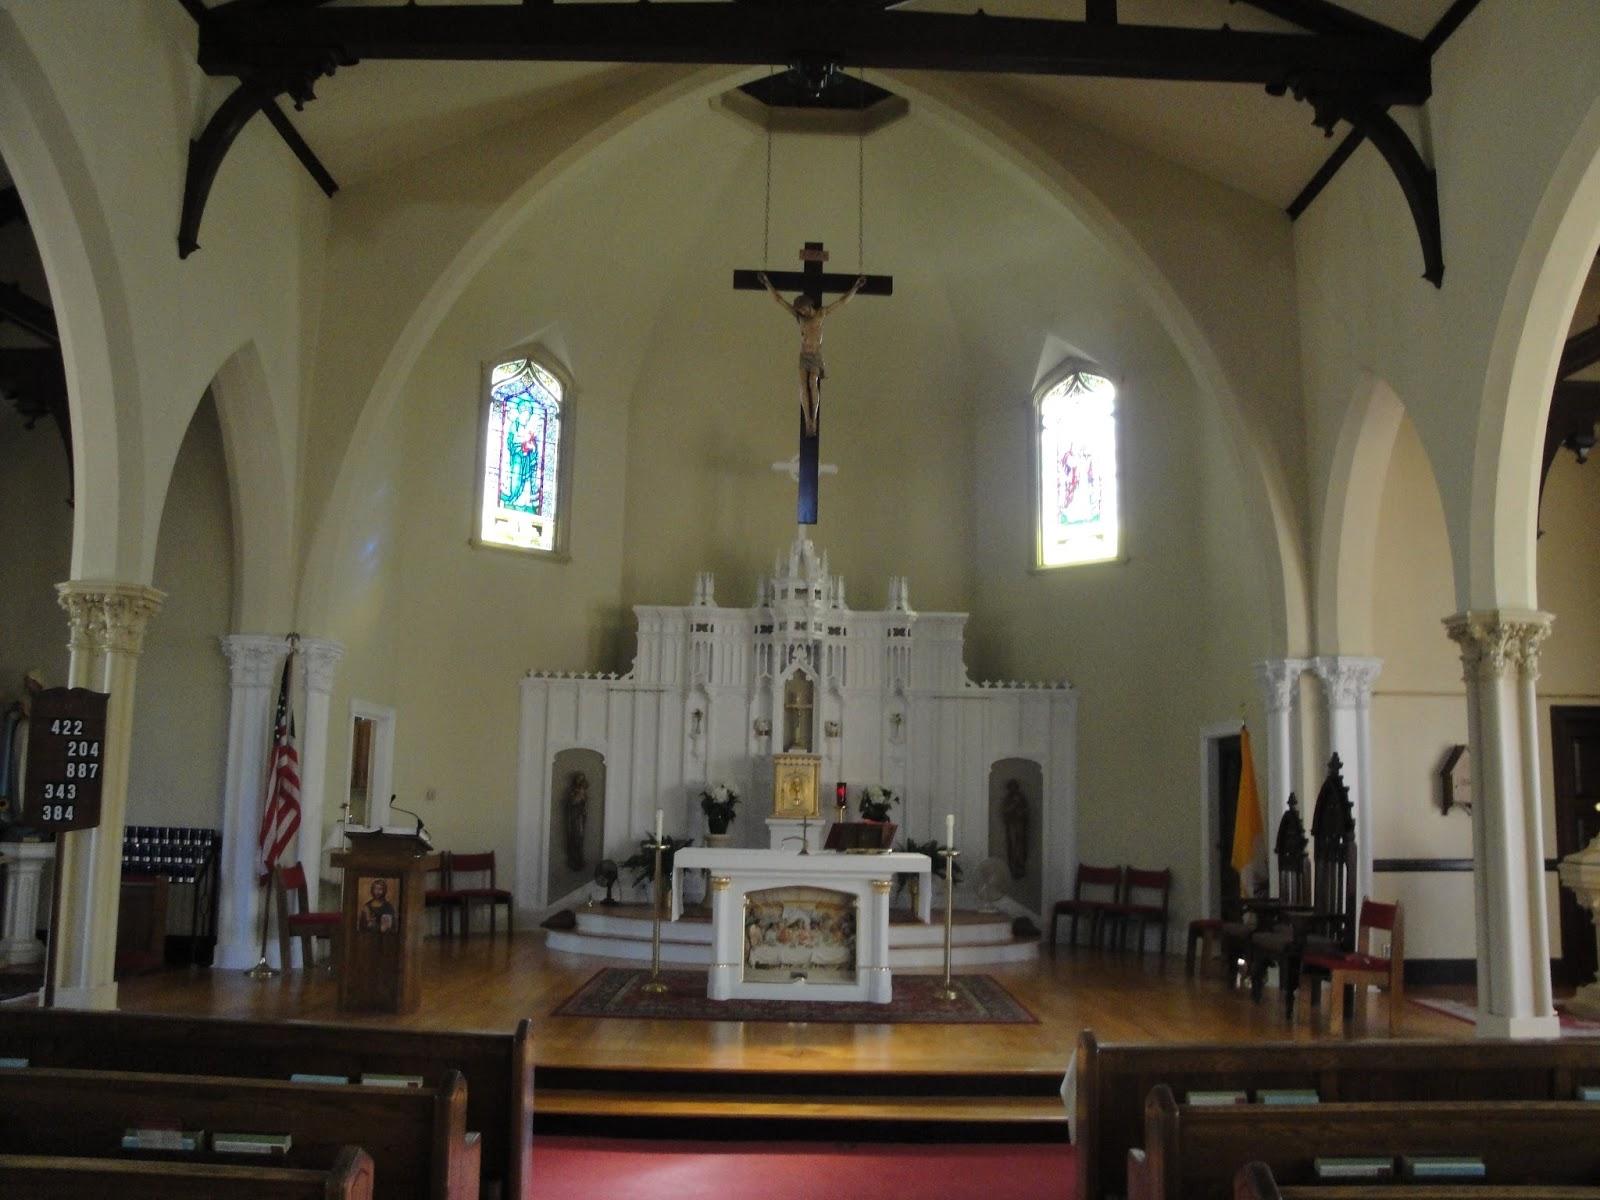 150 churches: church #71 - our lady of good help, burrillville